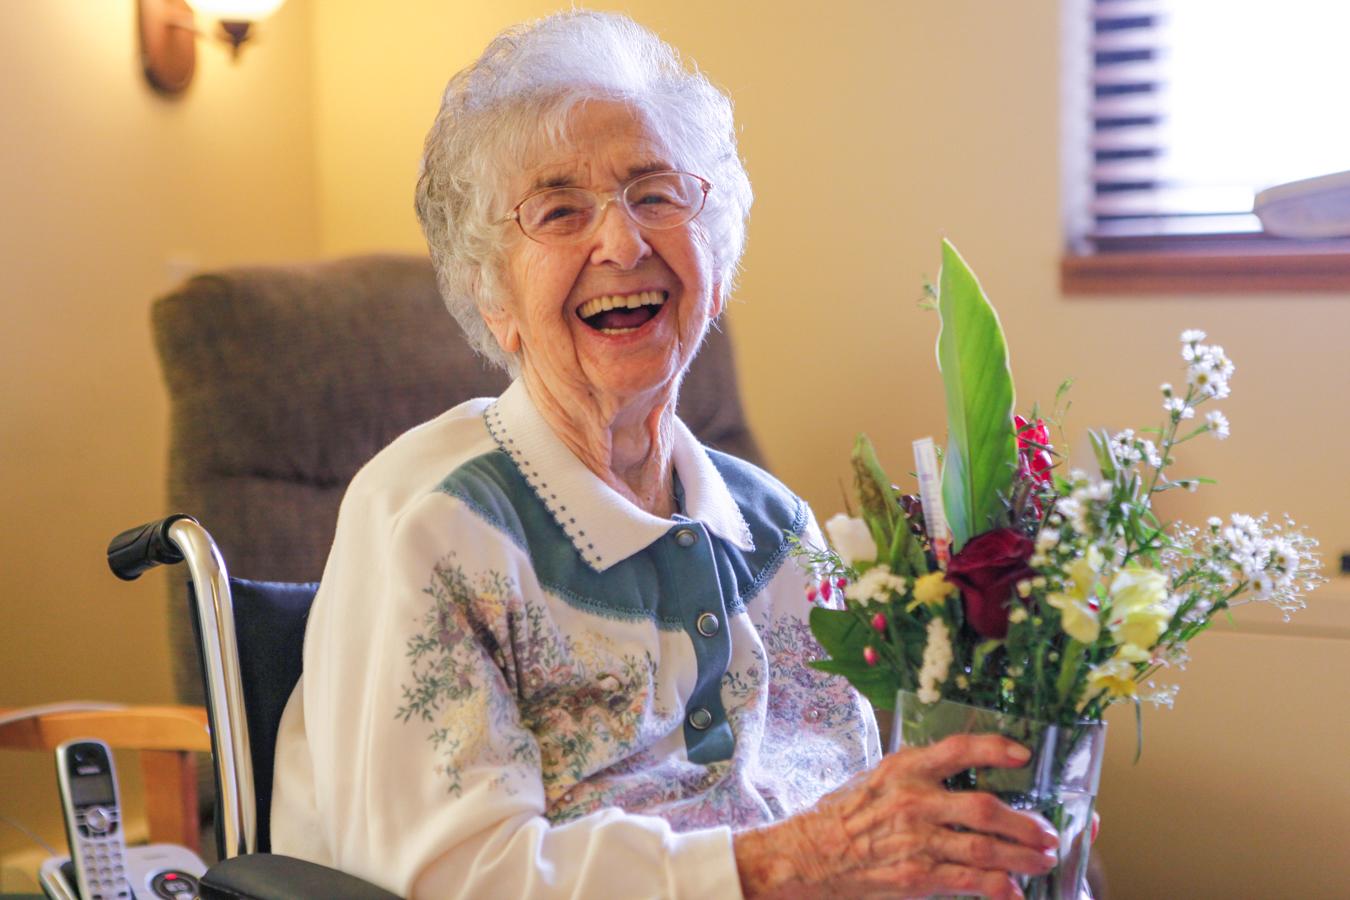 elderly-woman-with-flowers.jpg